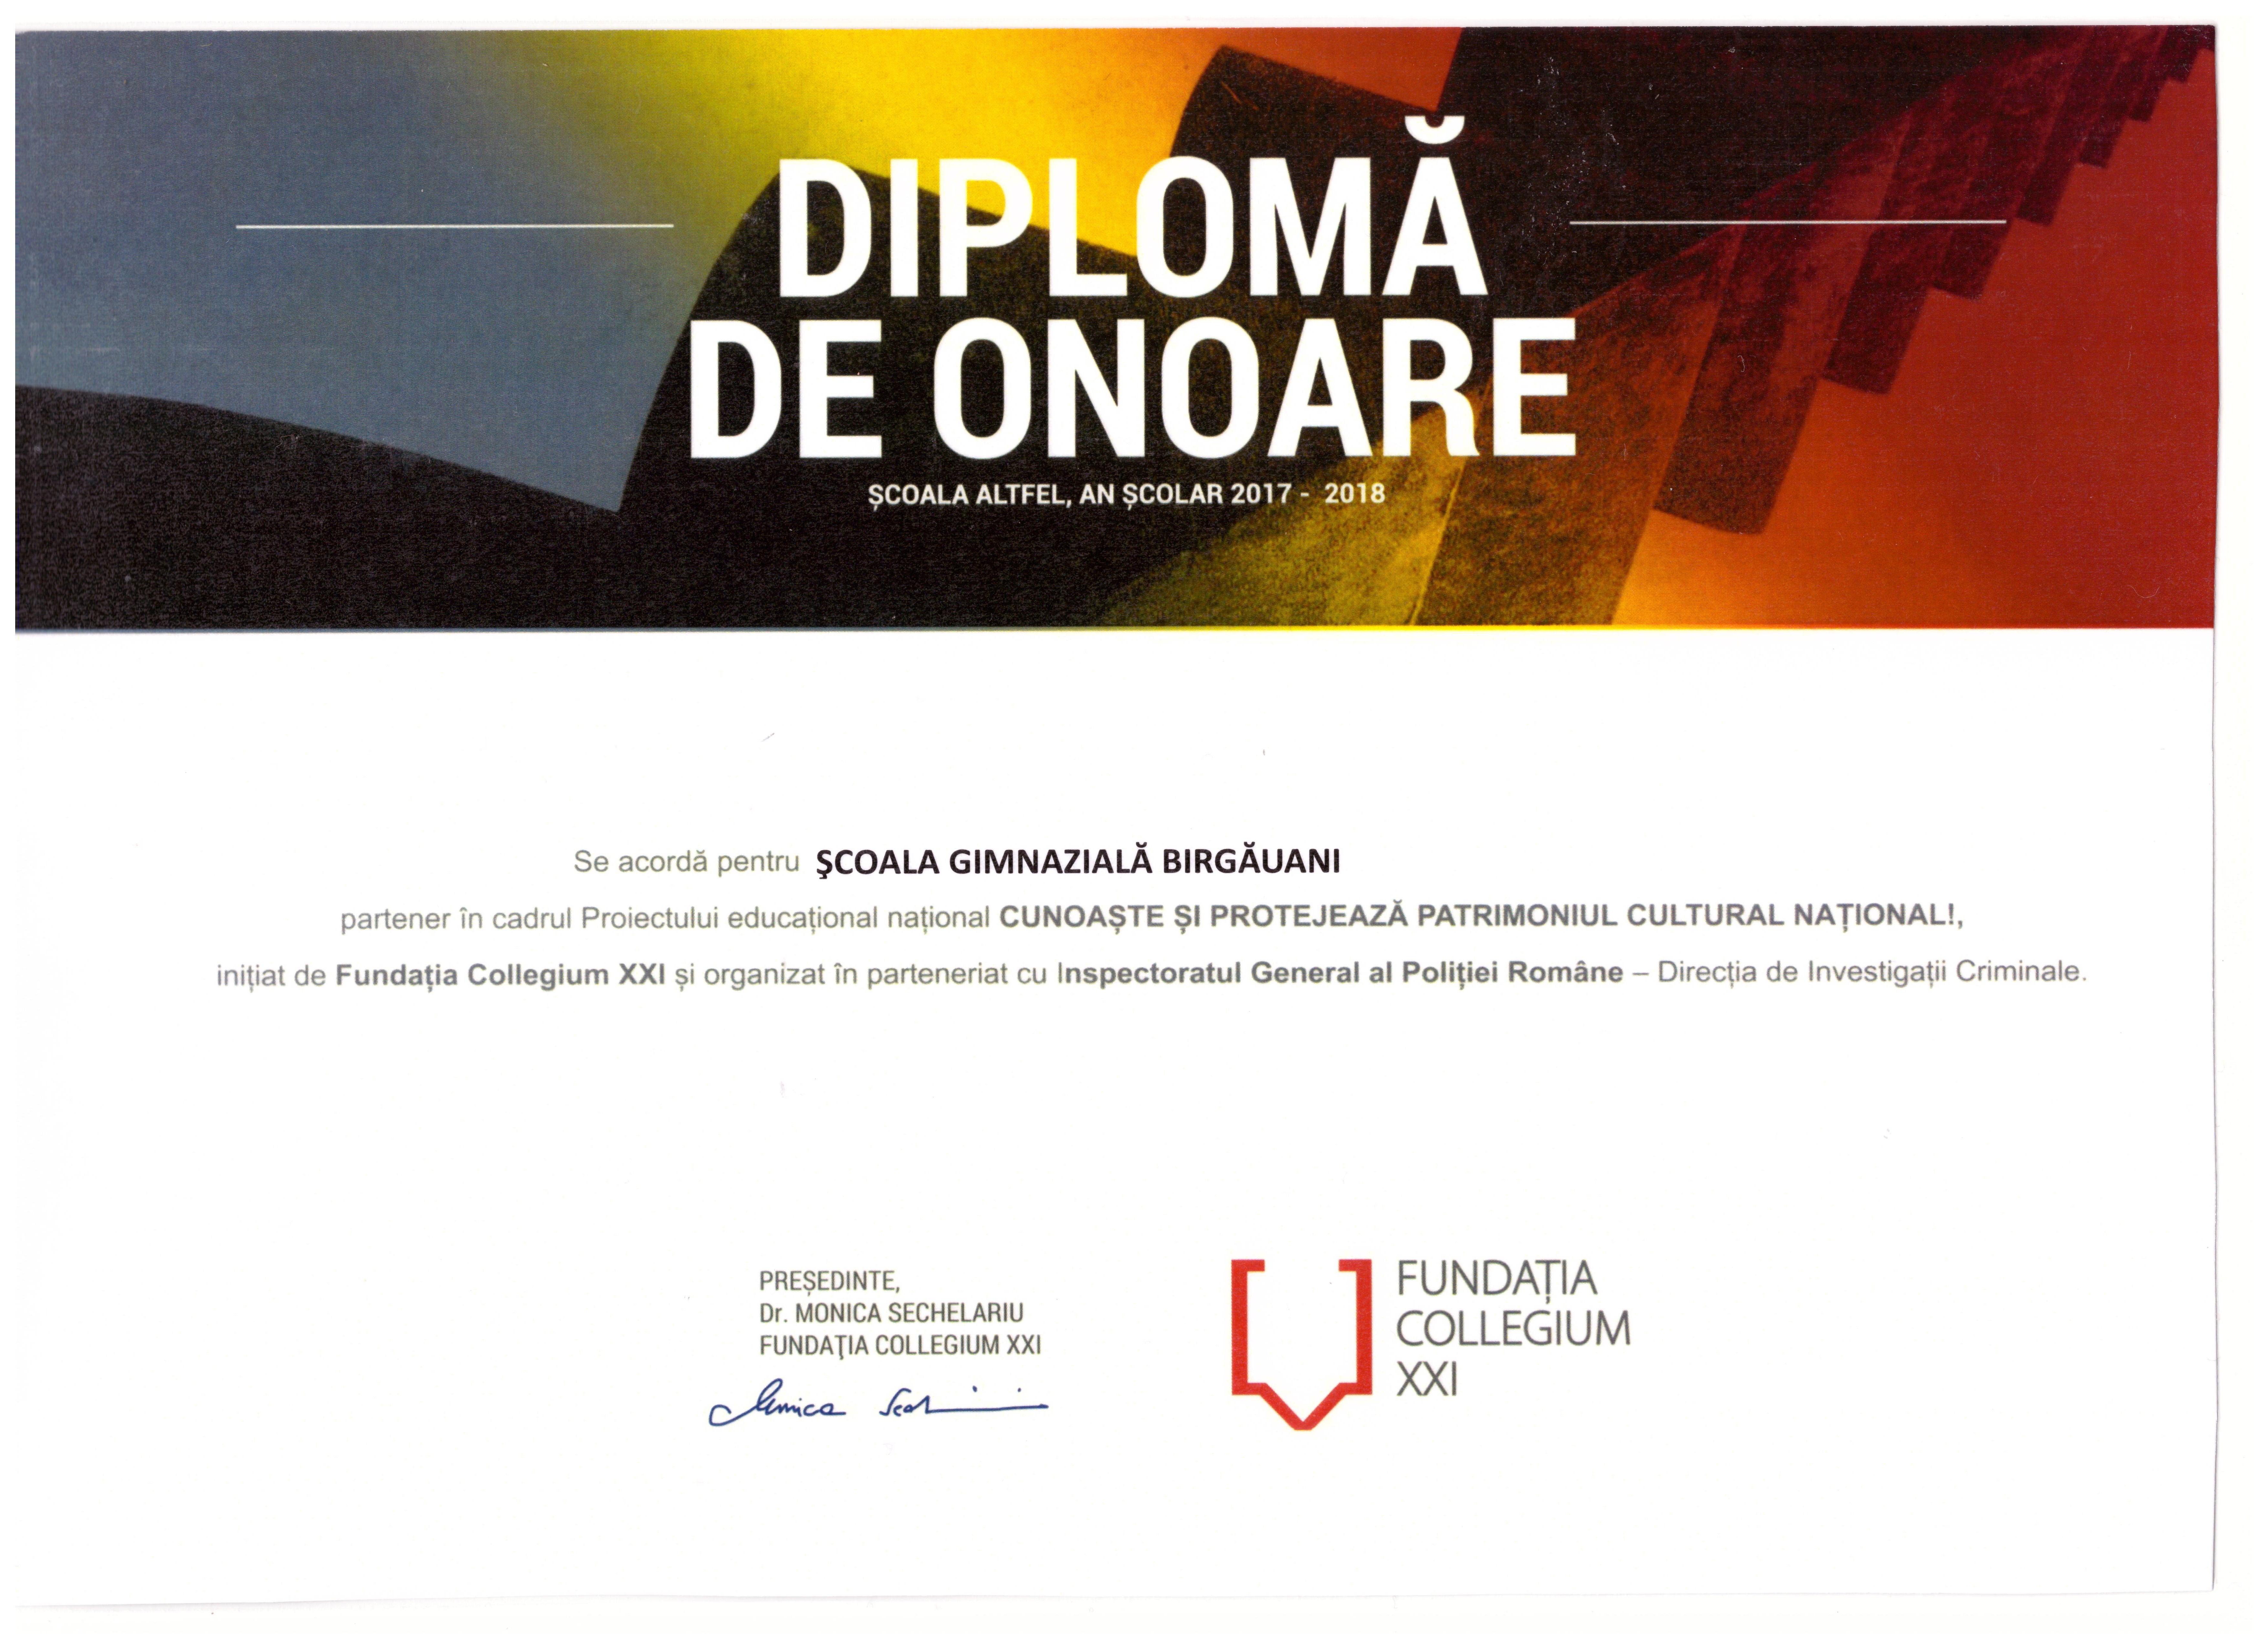 diploma-scoala